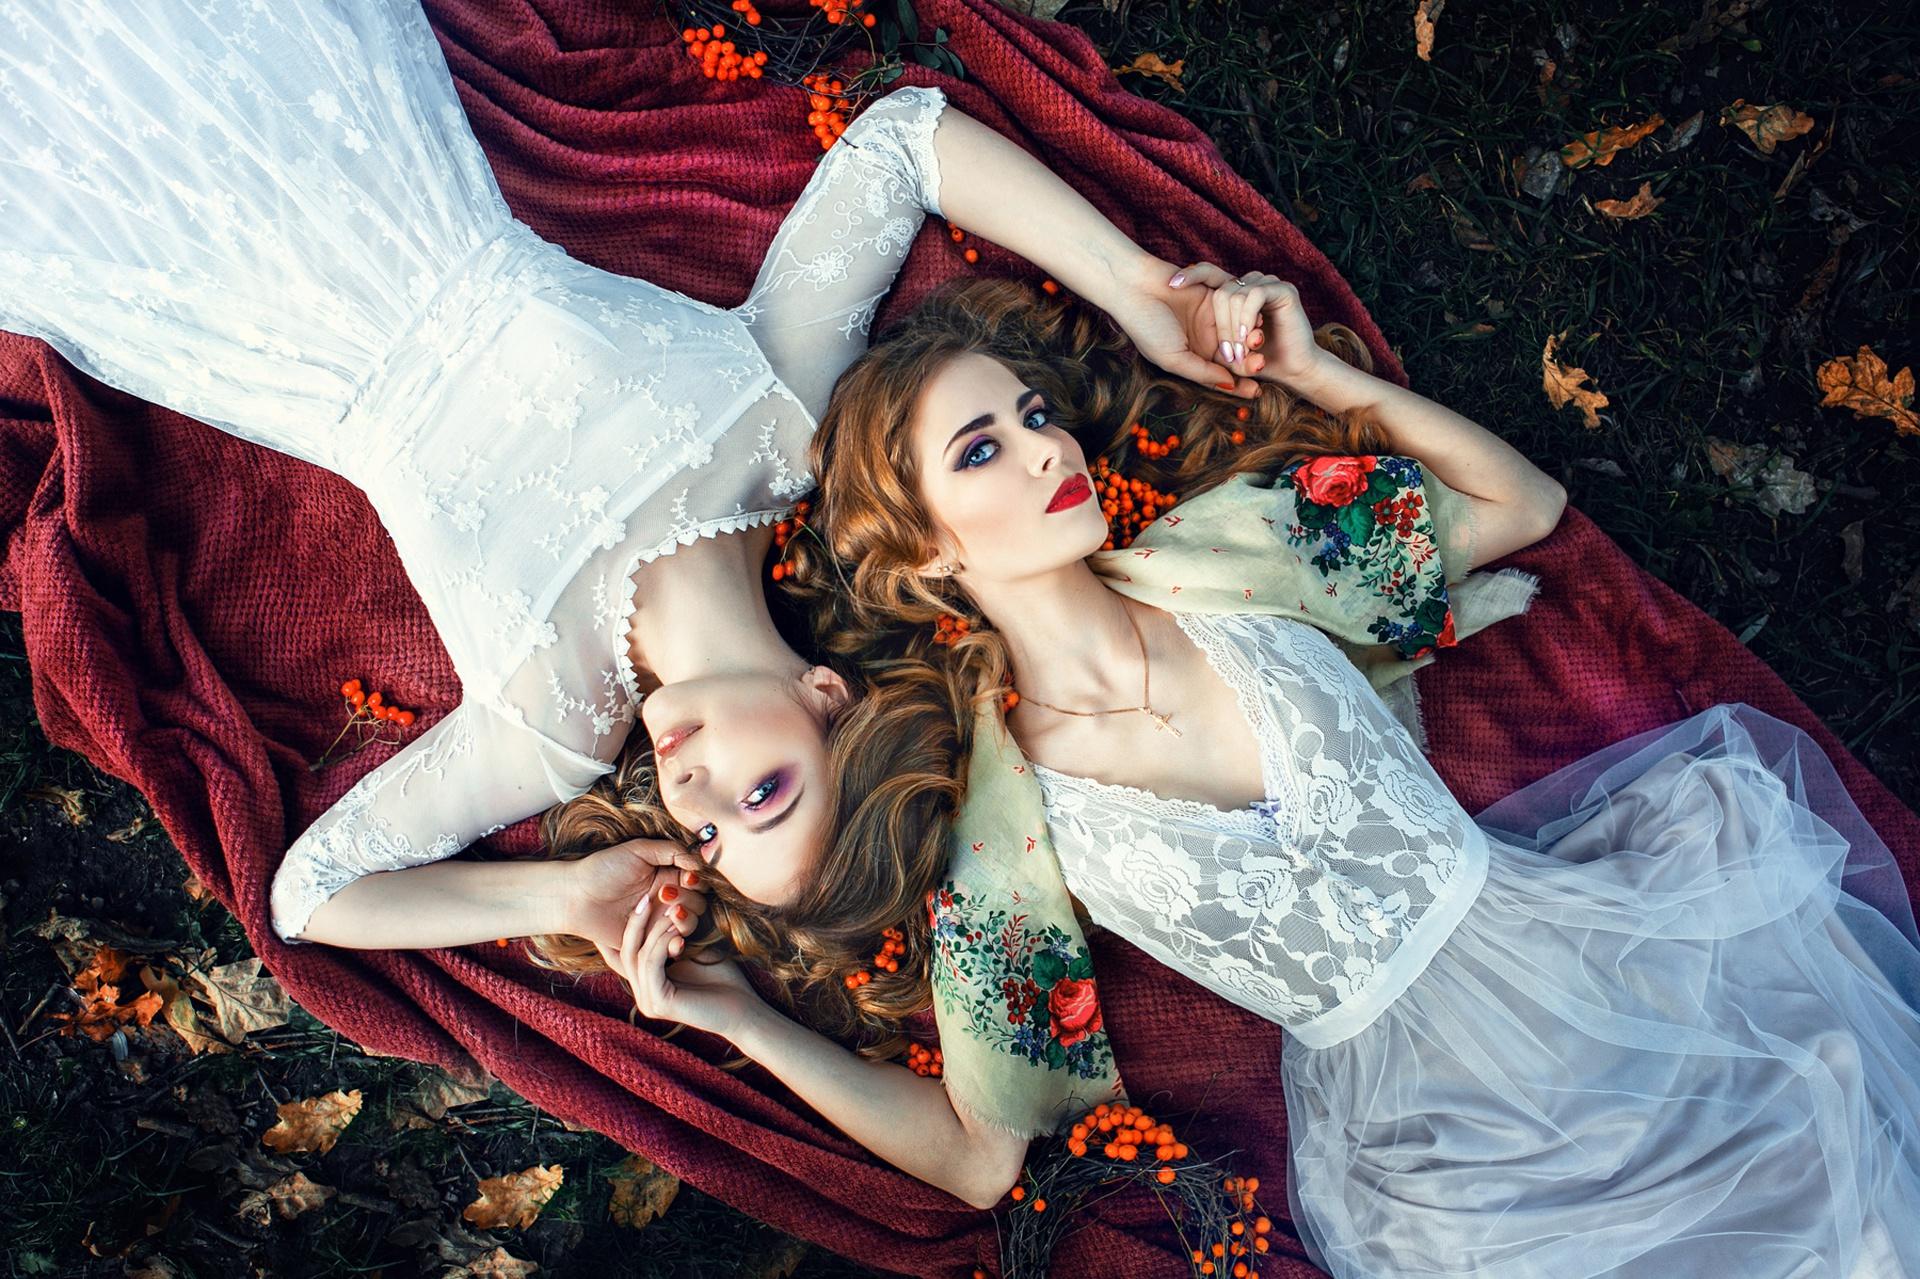 Blue Eyes Girl Lipstick Lying Down Redhead White Hair Woman 1920x1279